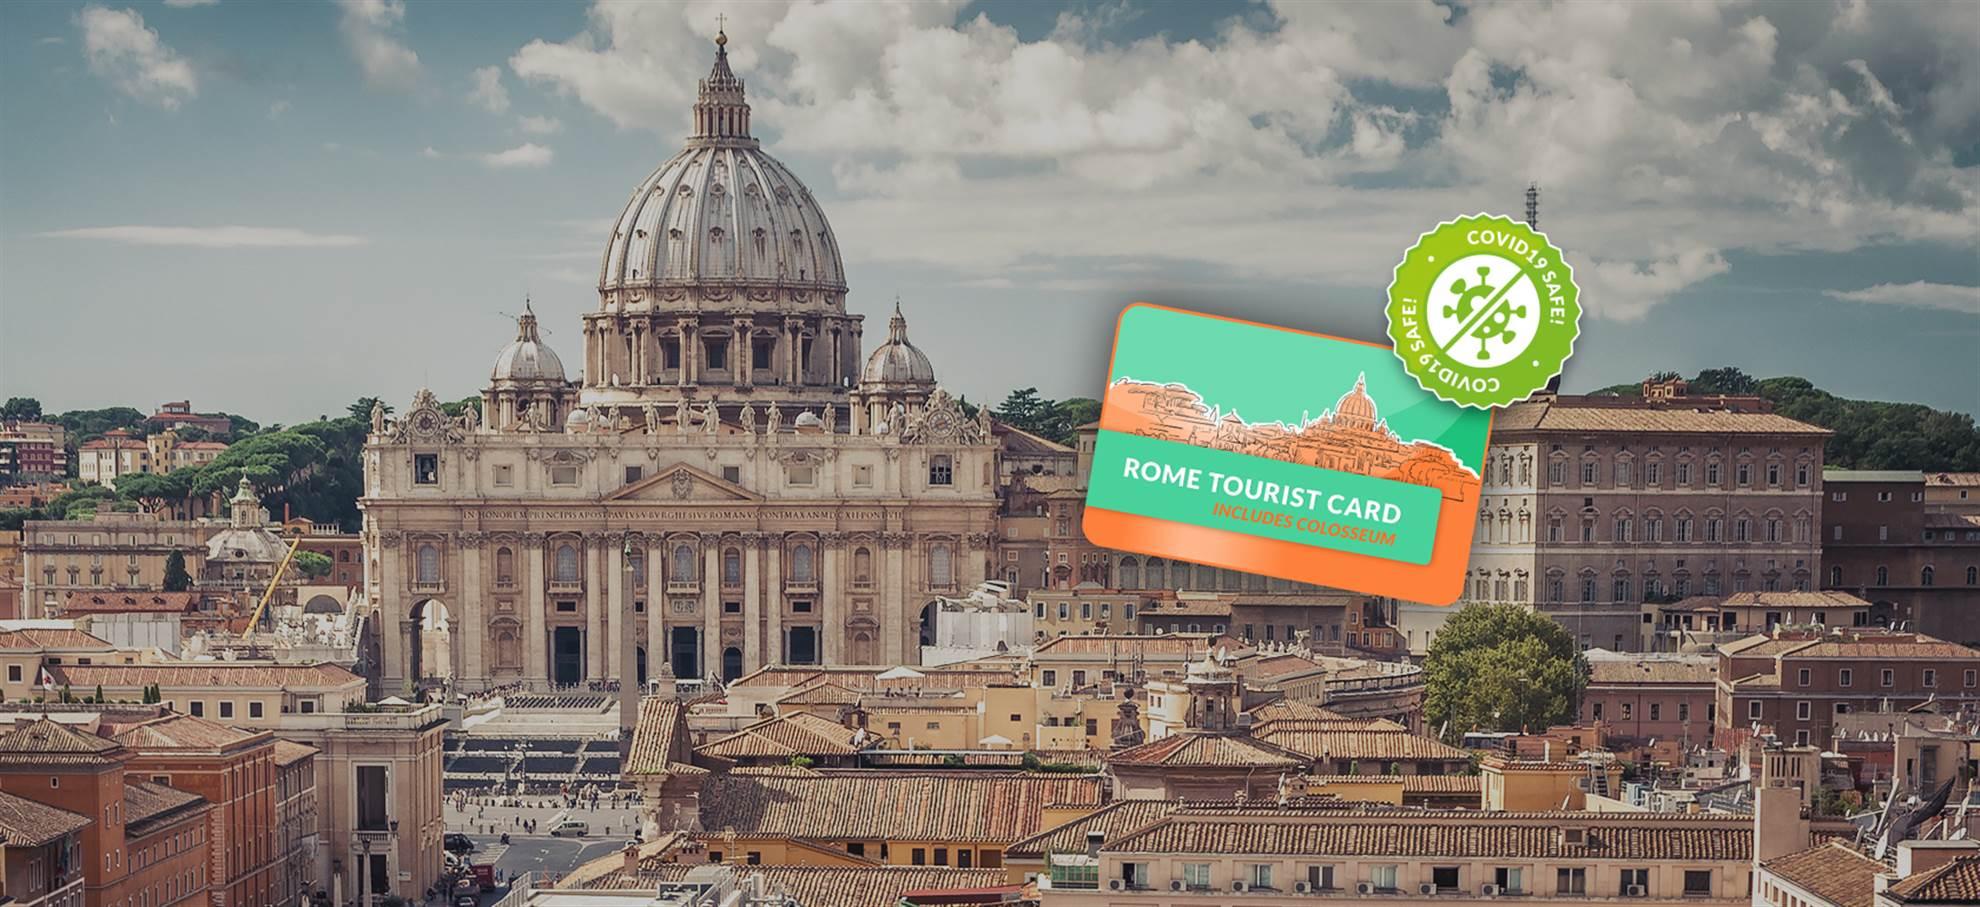 Róma Tourist Card